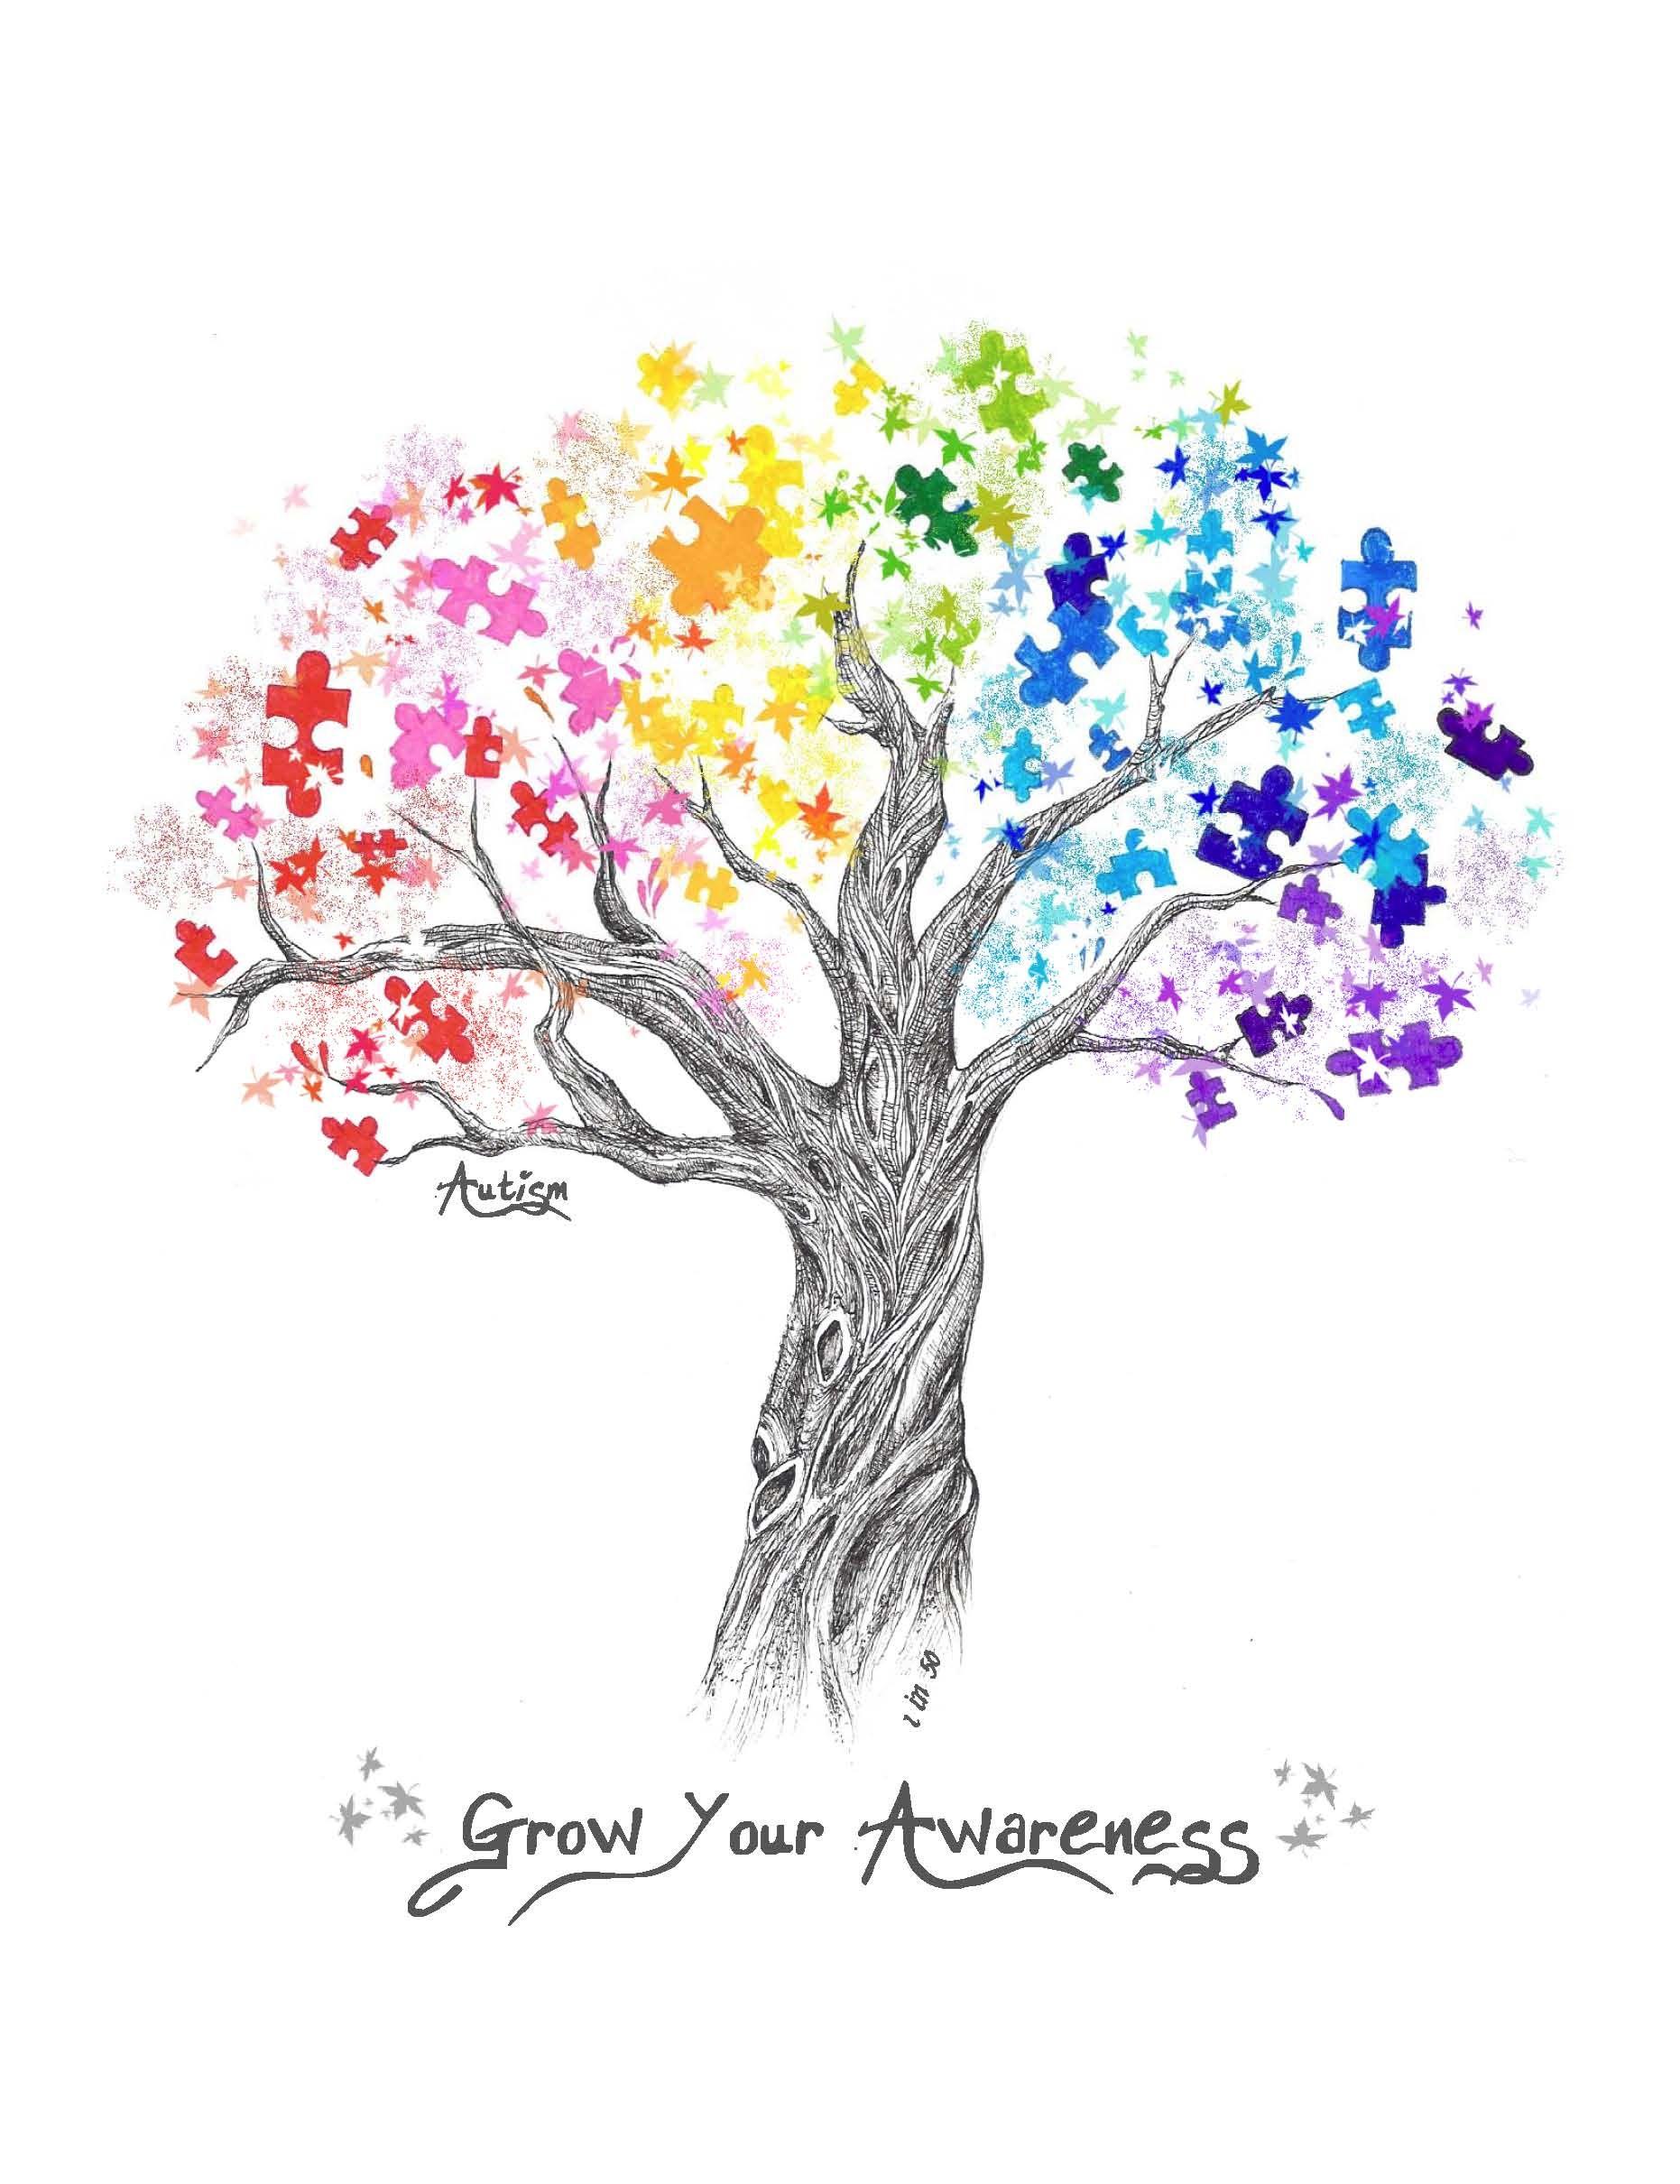 beautiful autism awareness logo Would make a great tattoo